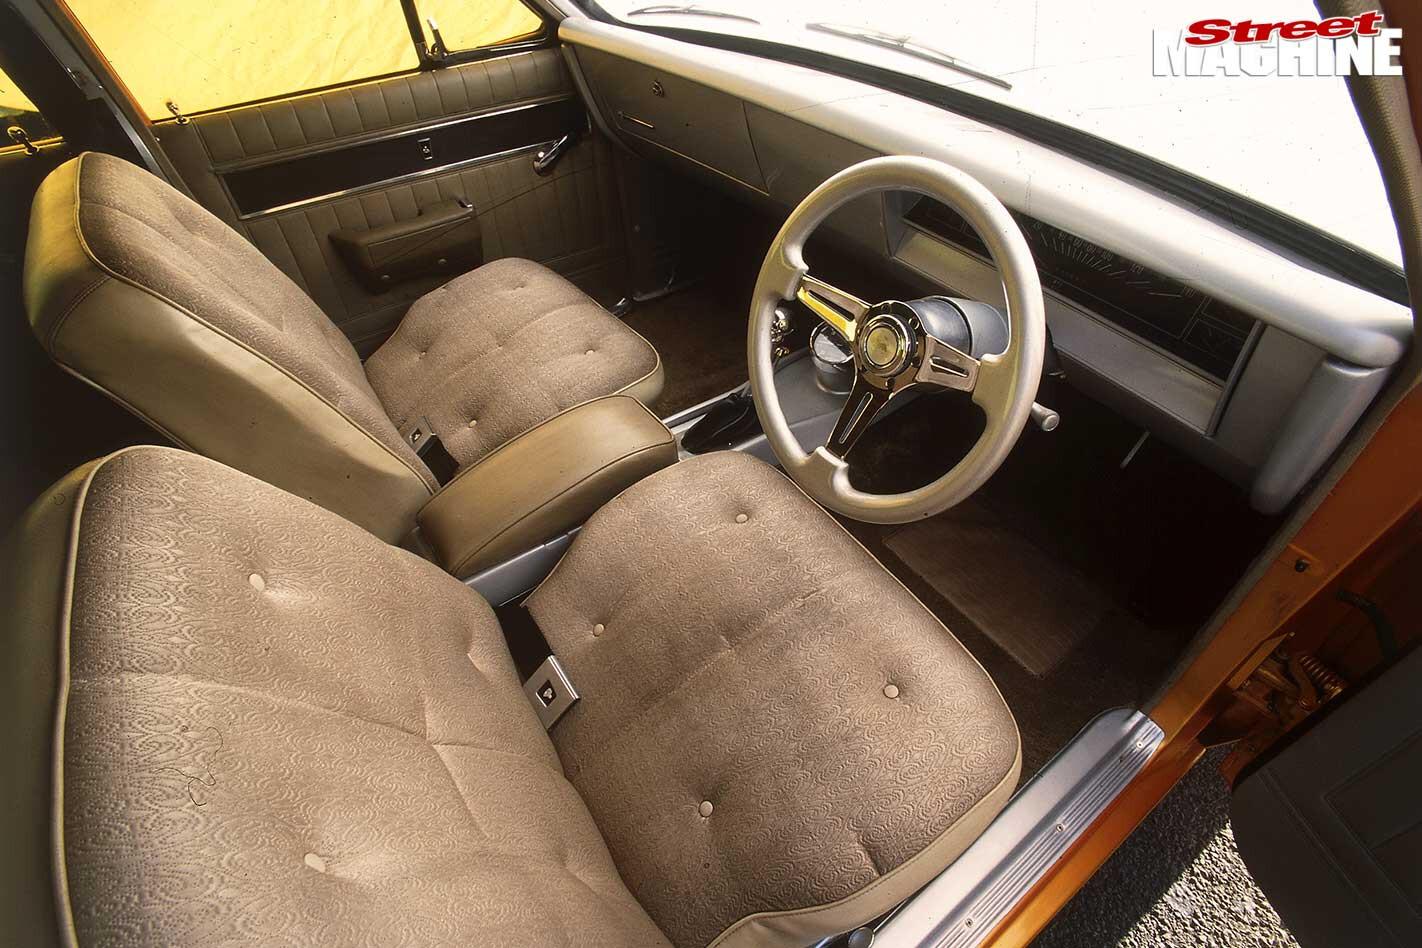 Holden HK Premier interior